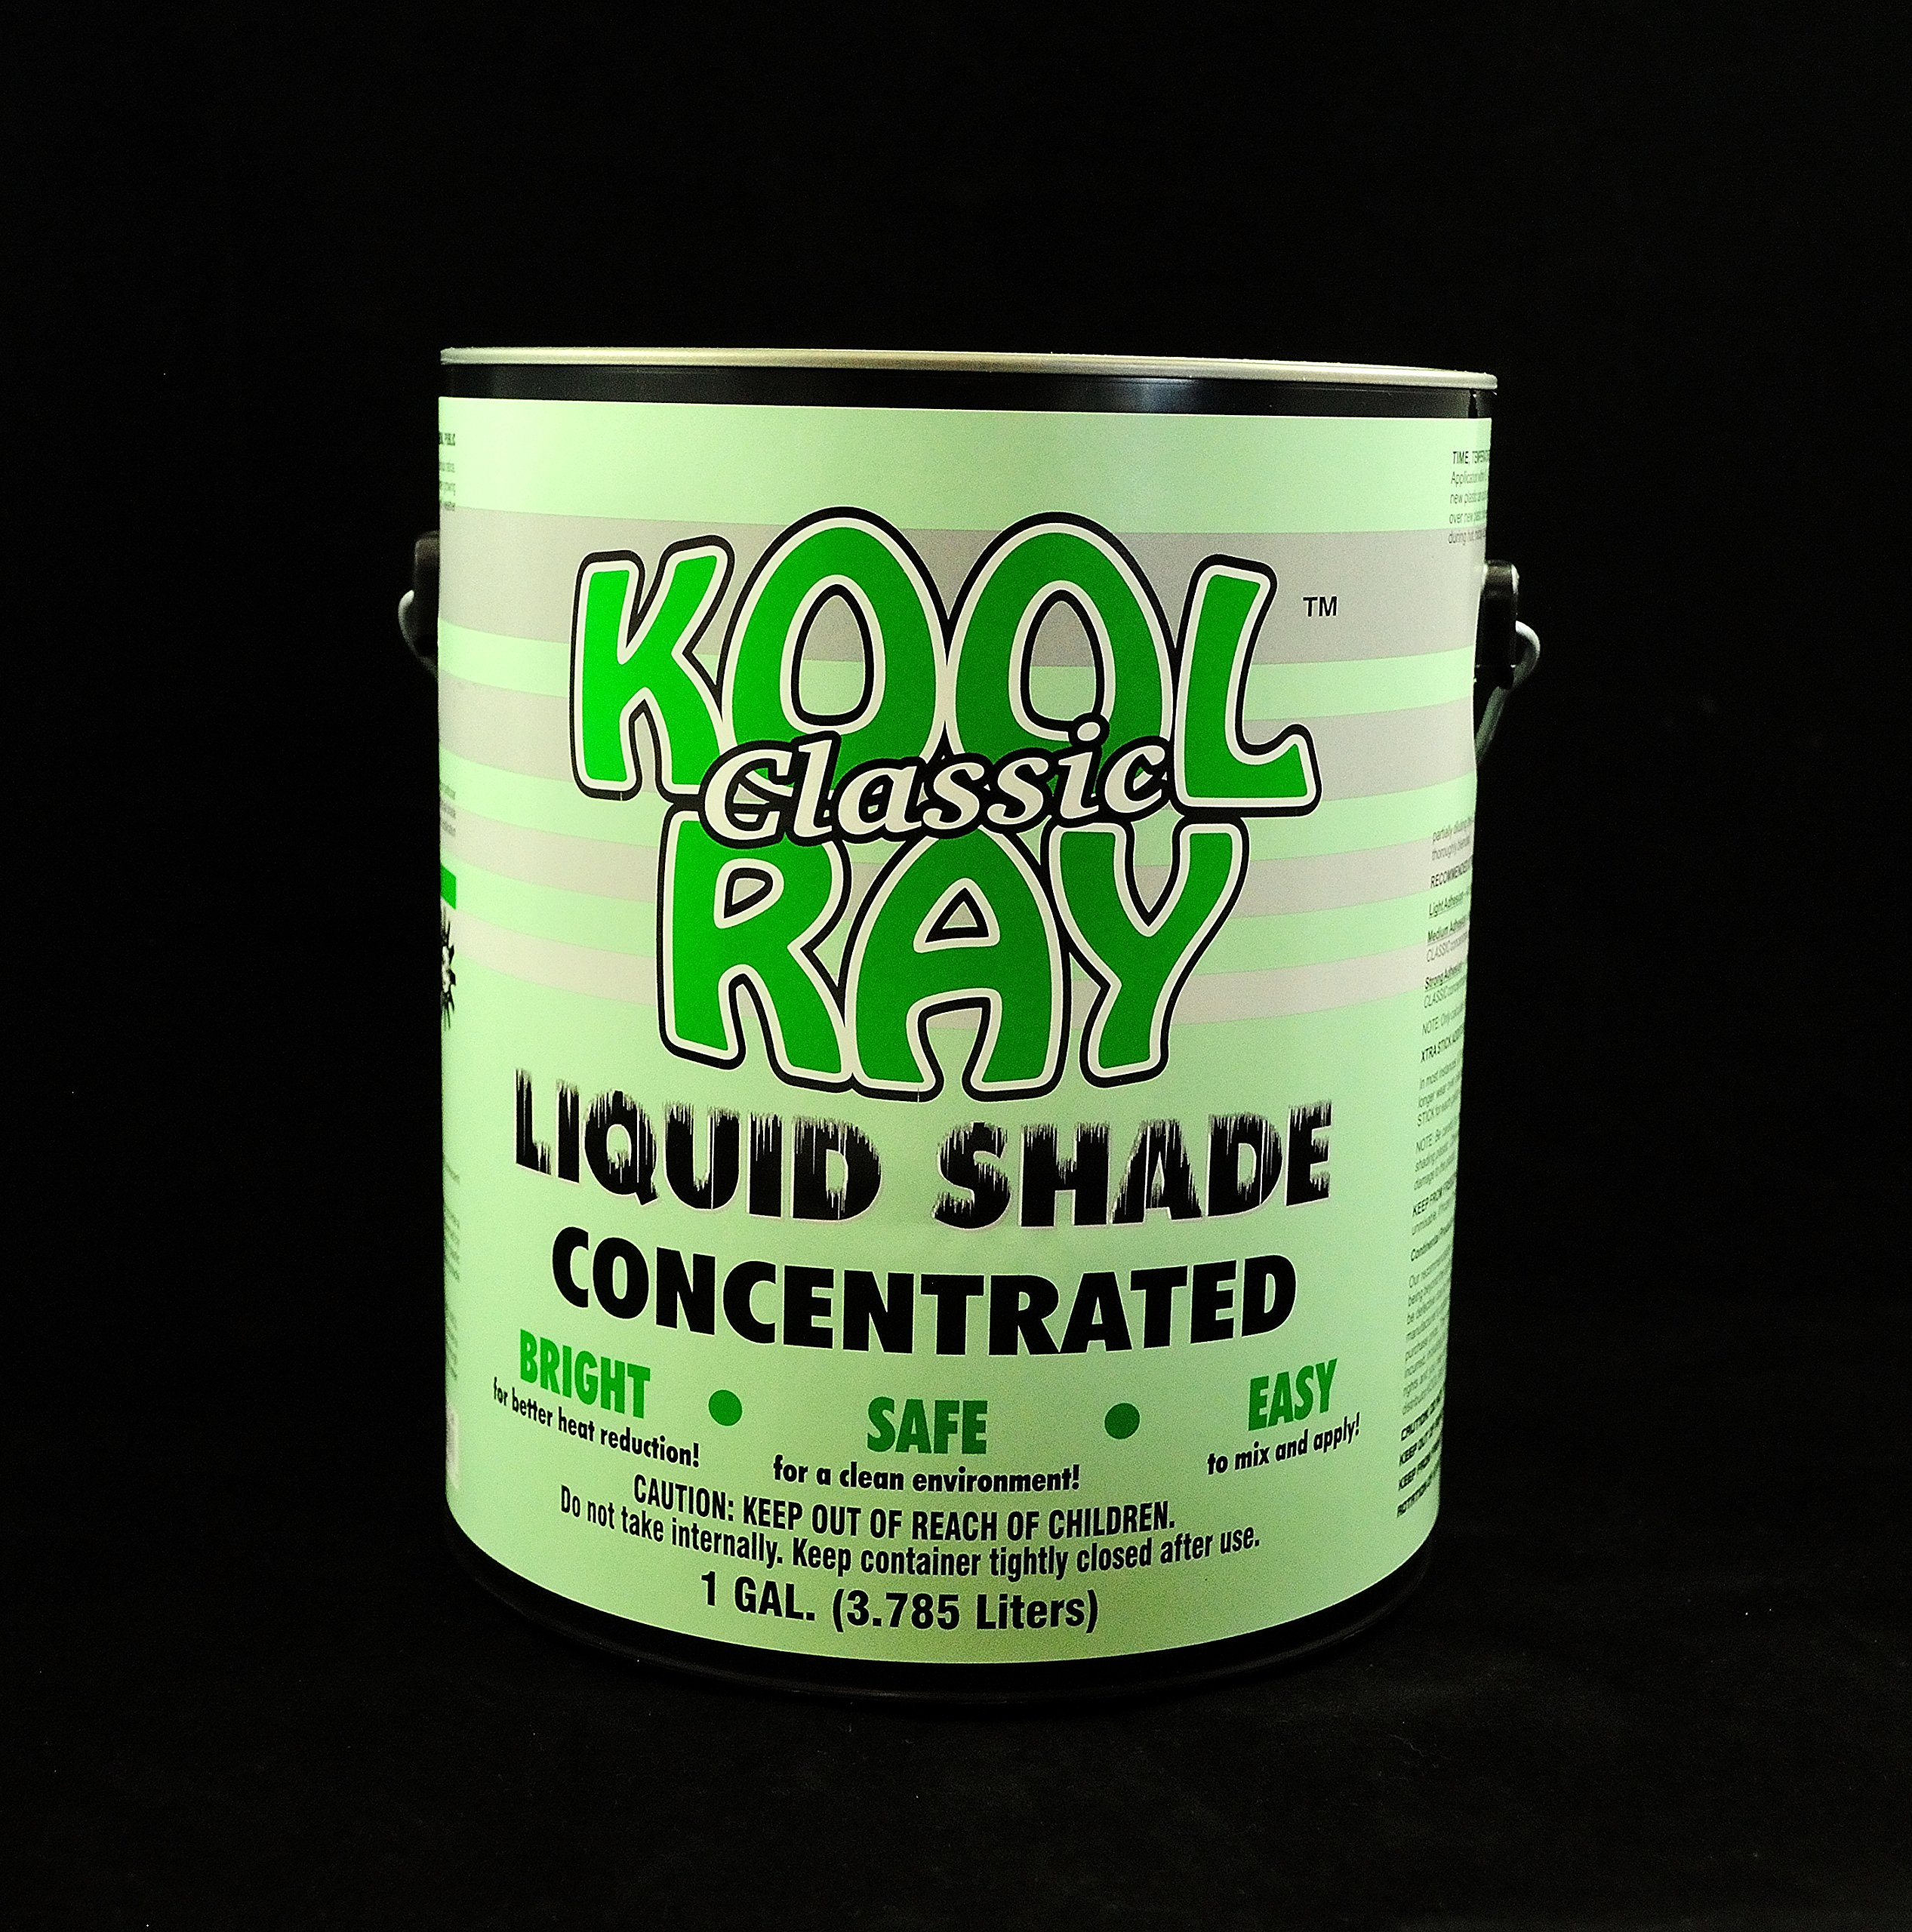 Classic Kool Ray Liquid Shade - Greenhouse Paint - White - 1 Gallon